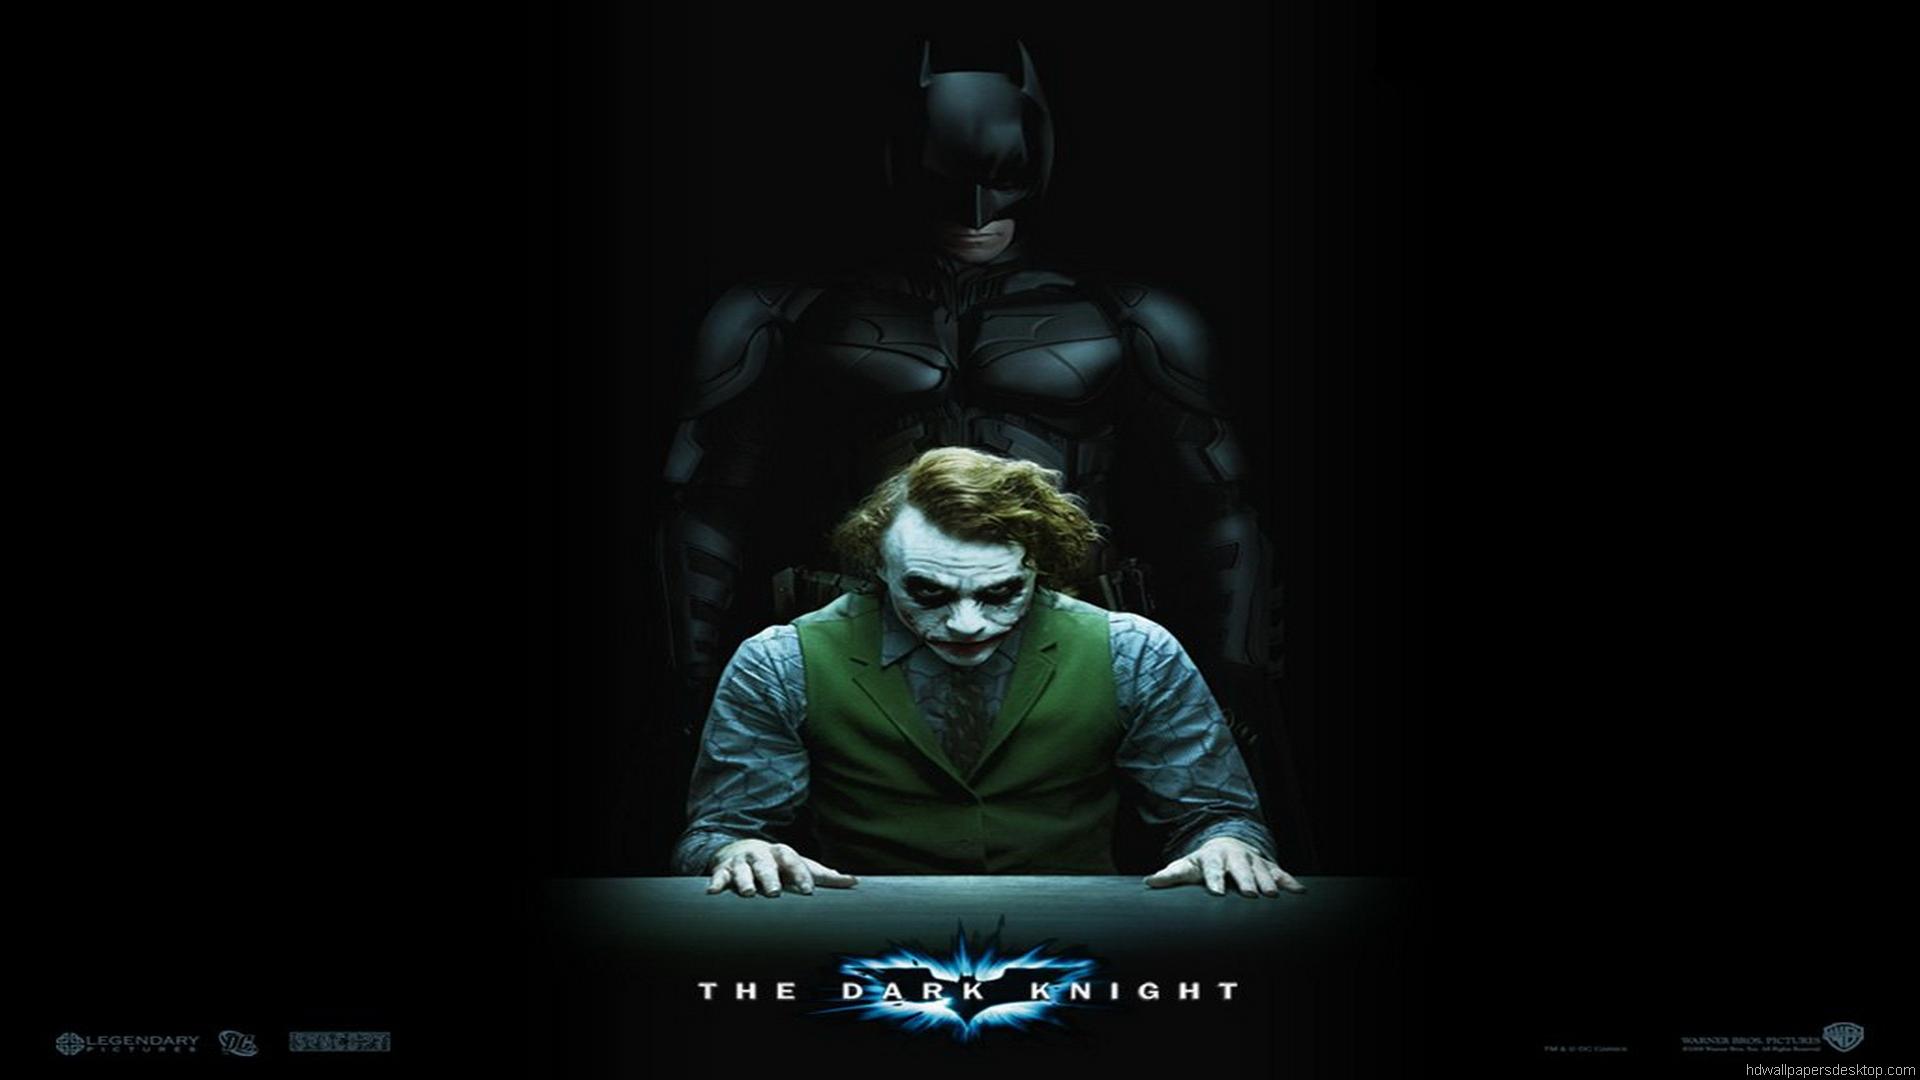 The Dark Knight Wallpaper Full HD 1080p Batman Wallpapers Desktop 1920x1080